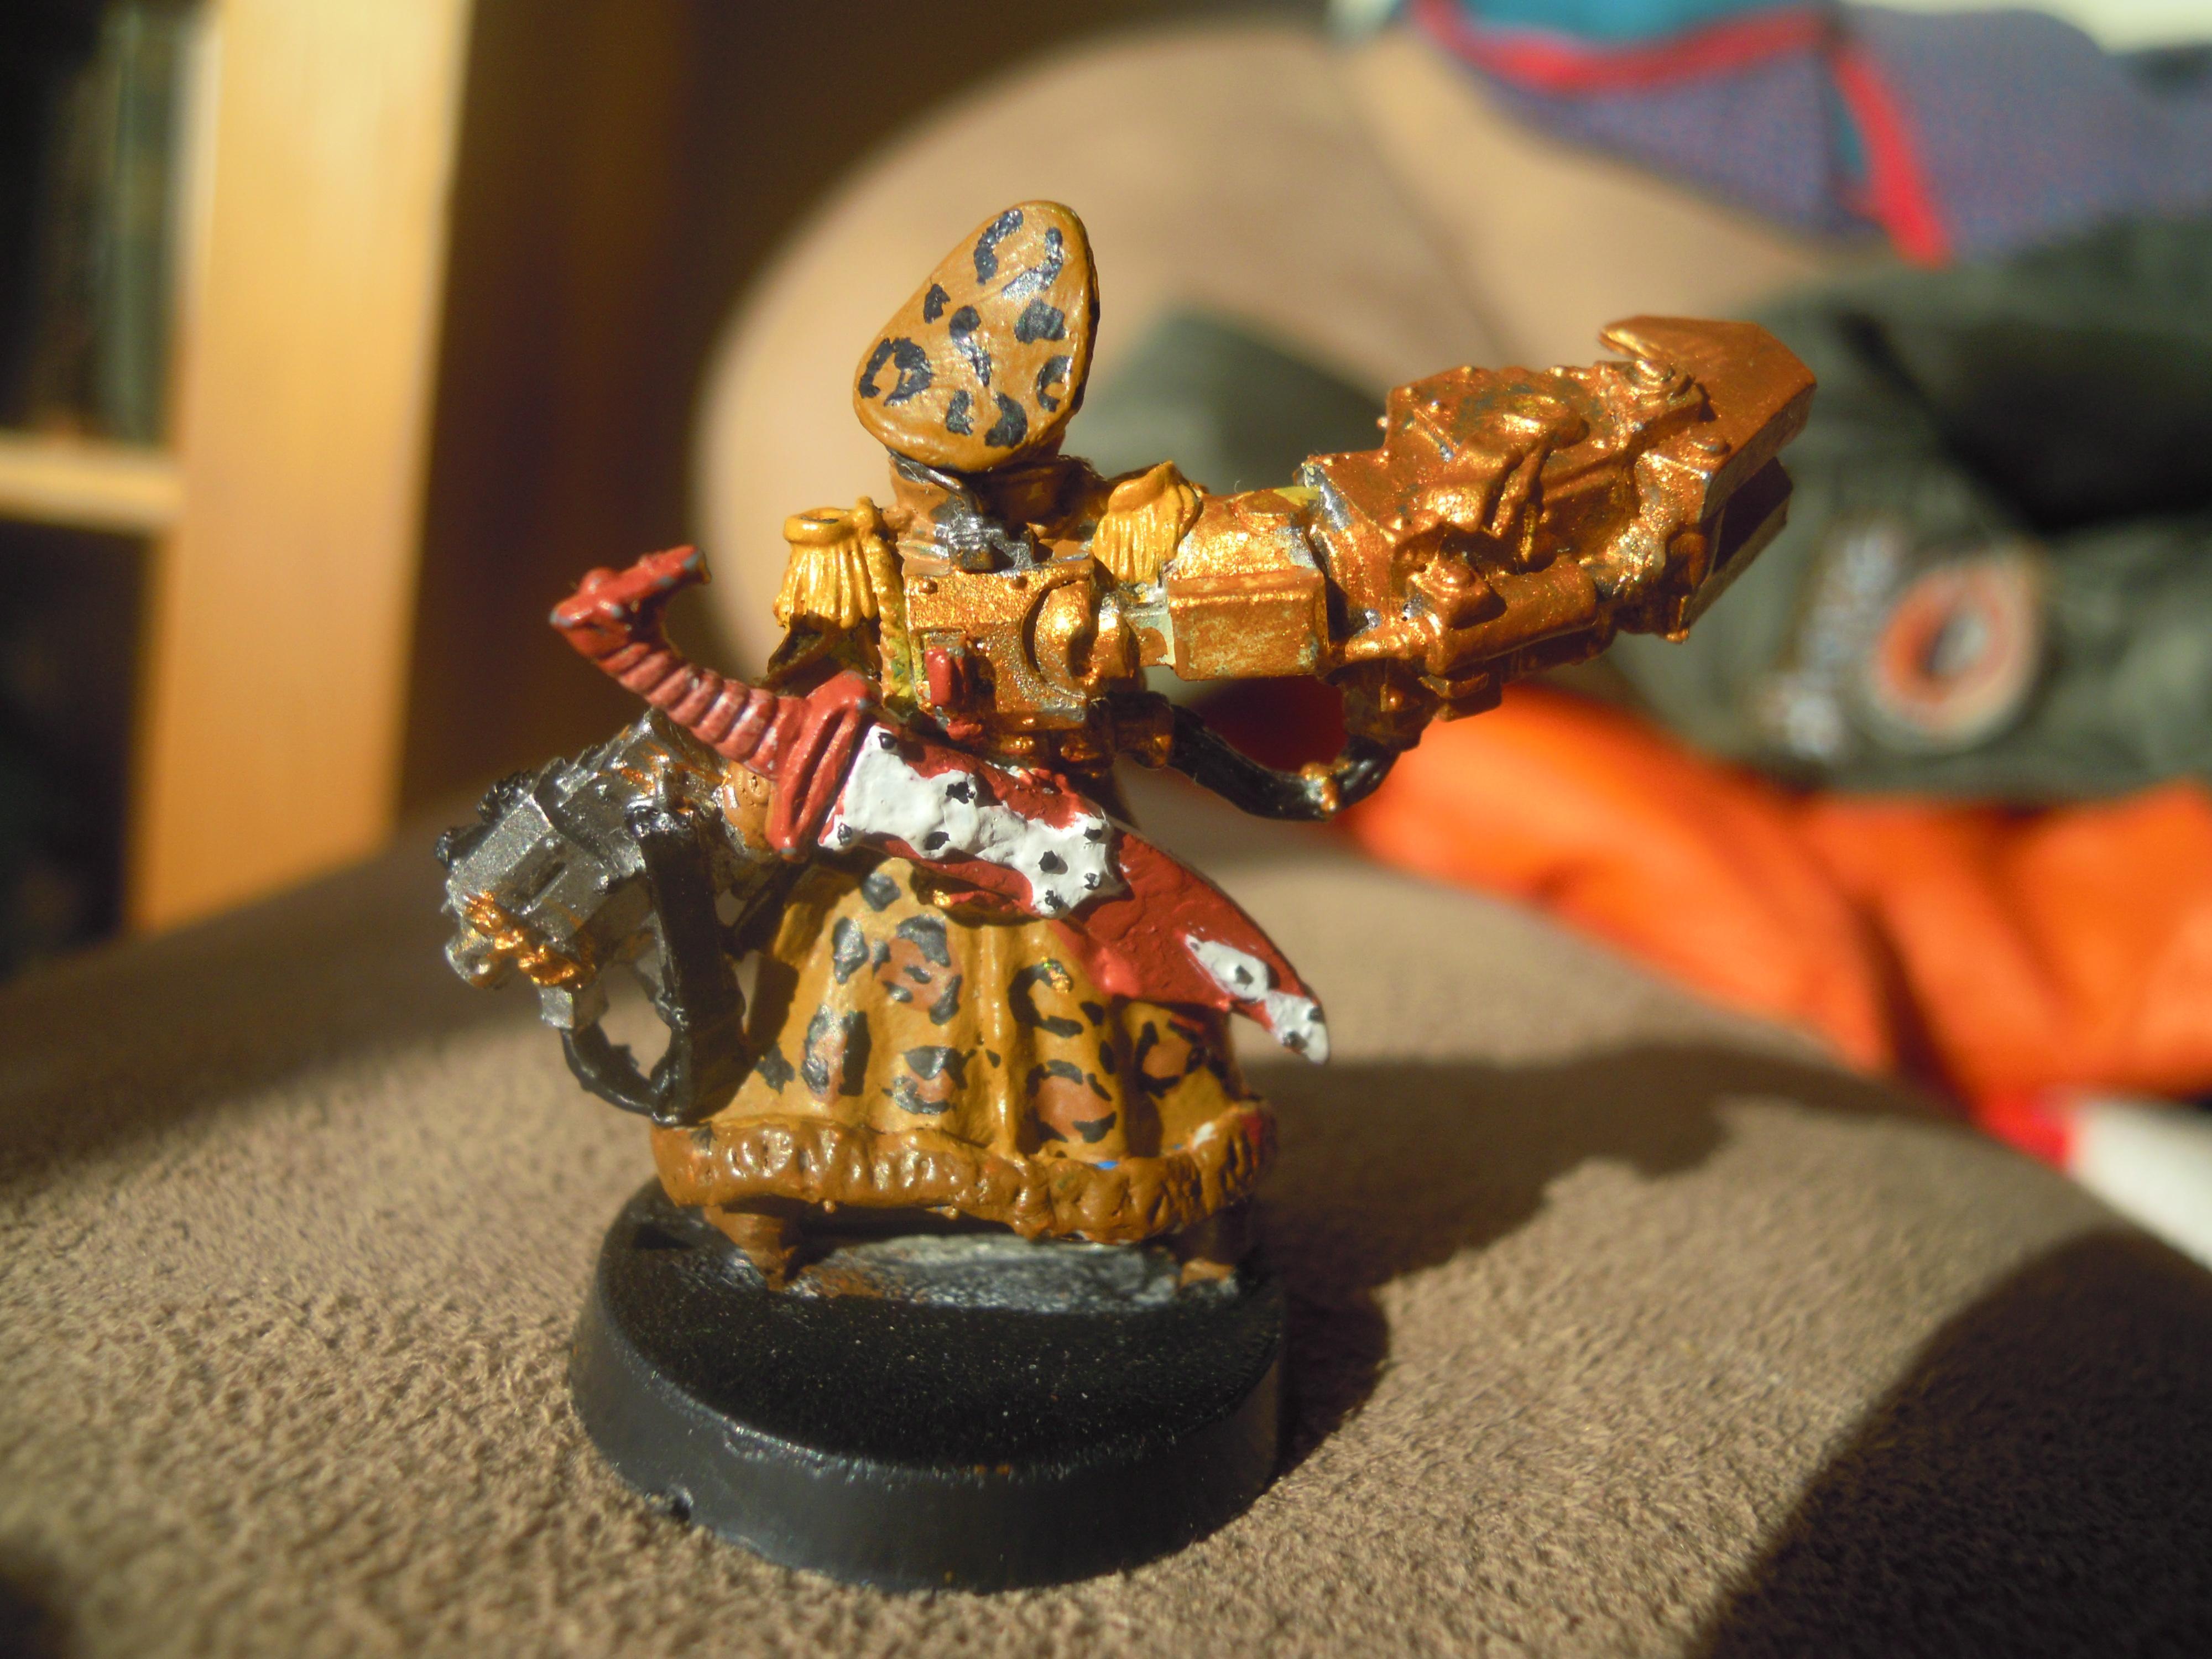 Commissar, Imperial Guard, Leopard, Power Klaw, Sword, Yarrick